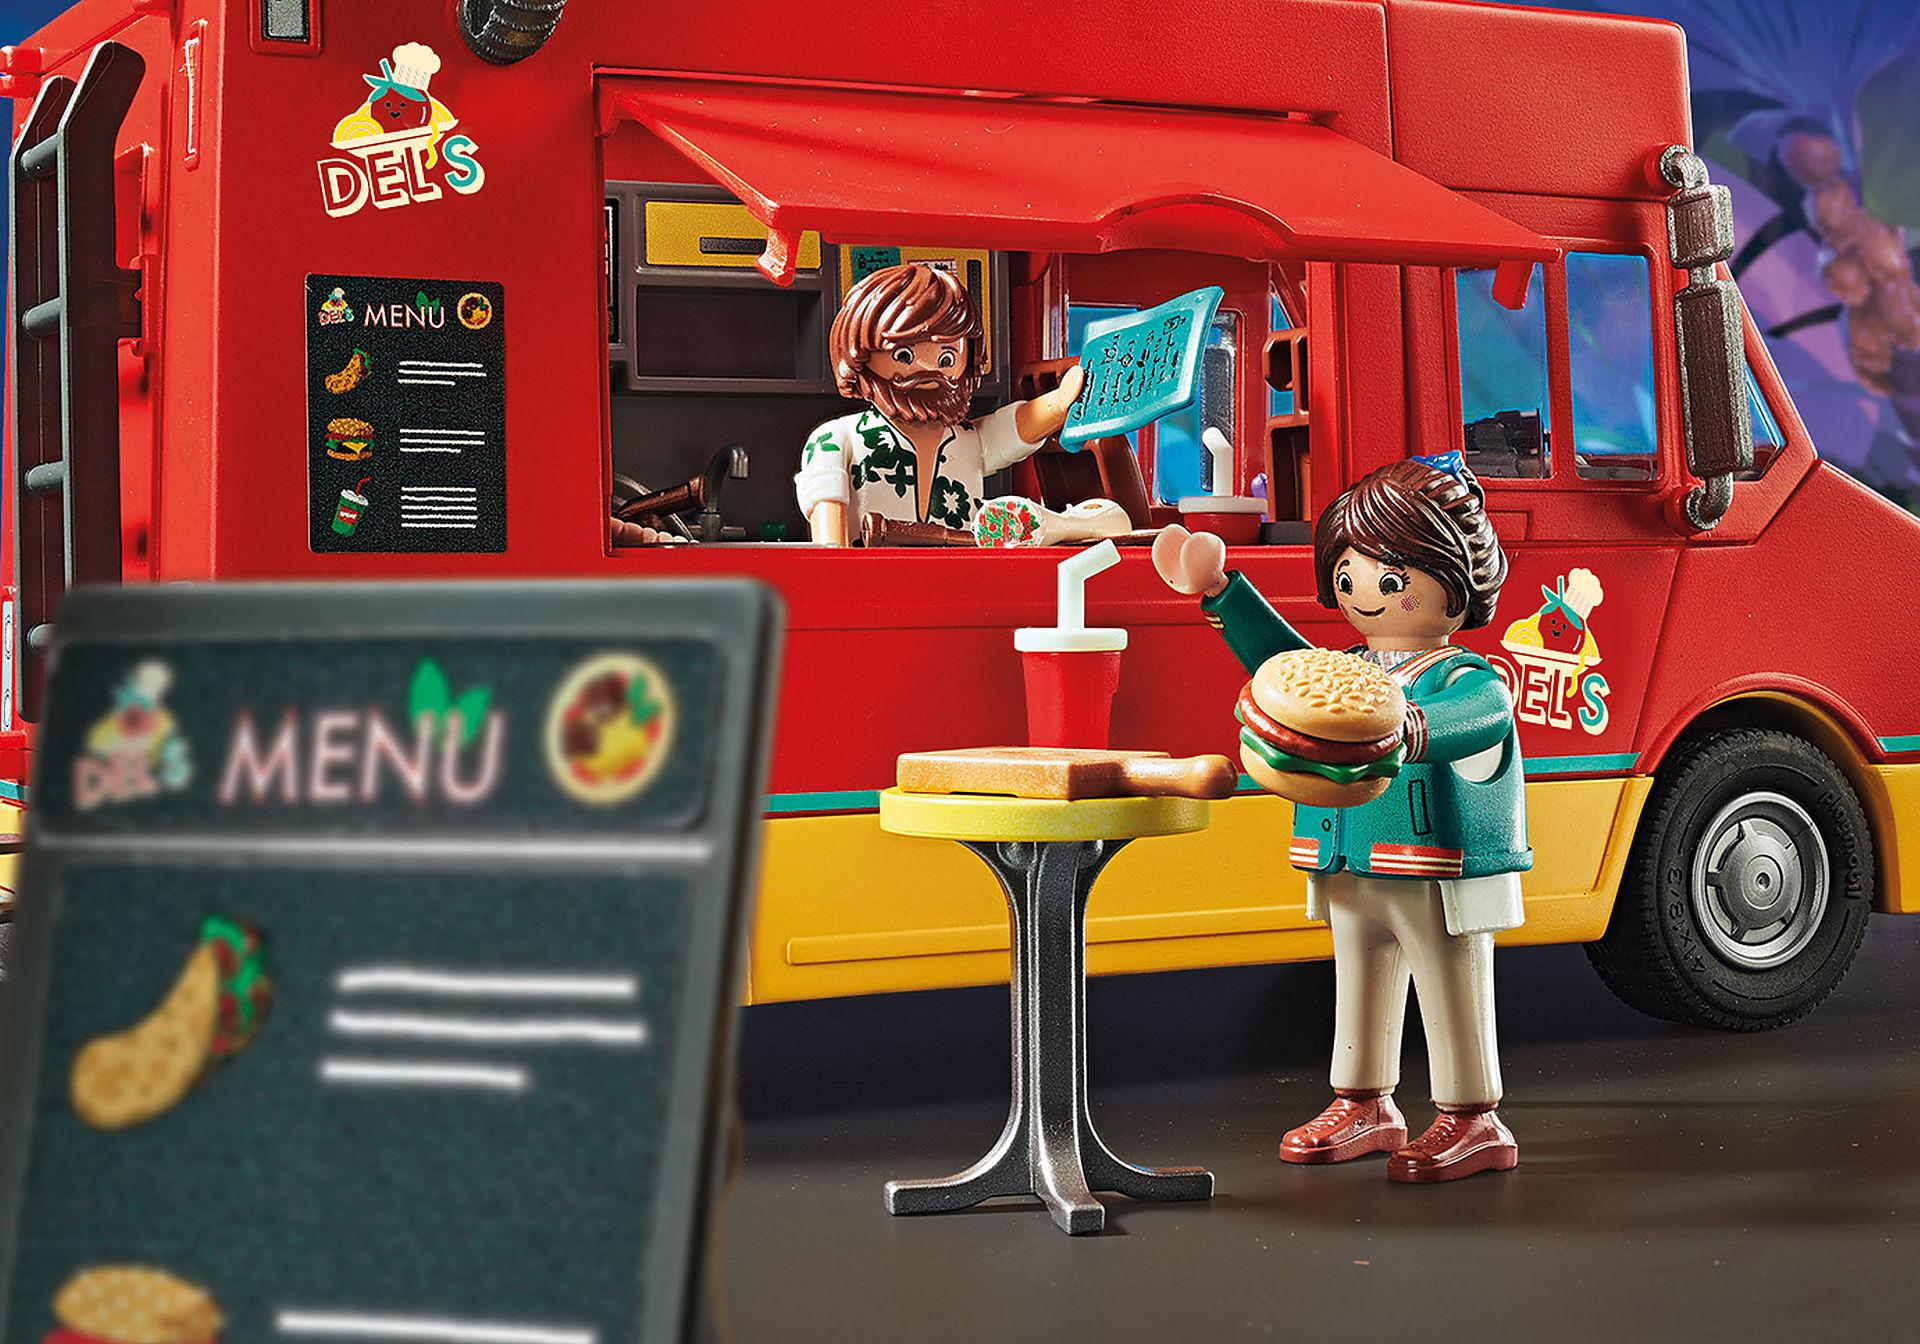 http://media.playmobil.com/i/playmobil/70075_product_extra2/PLAYMOBIL: THE MOVIE Food Truck de Del